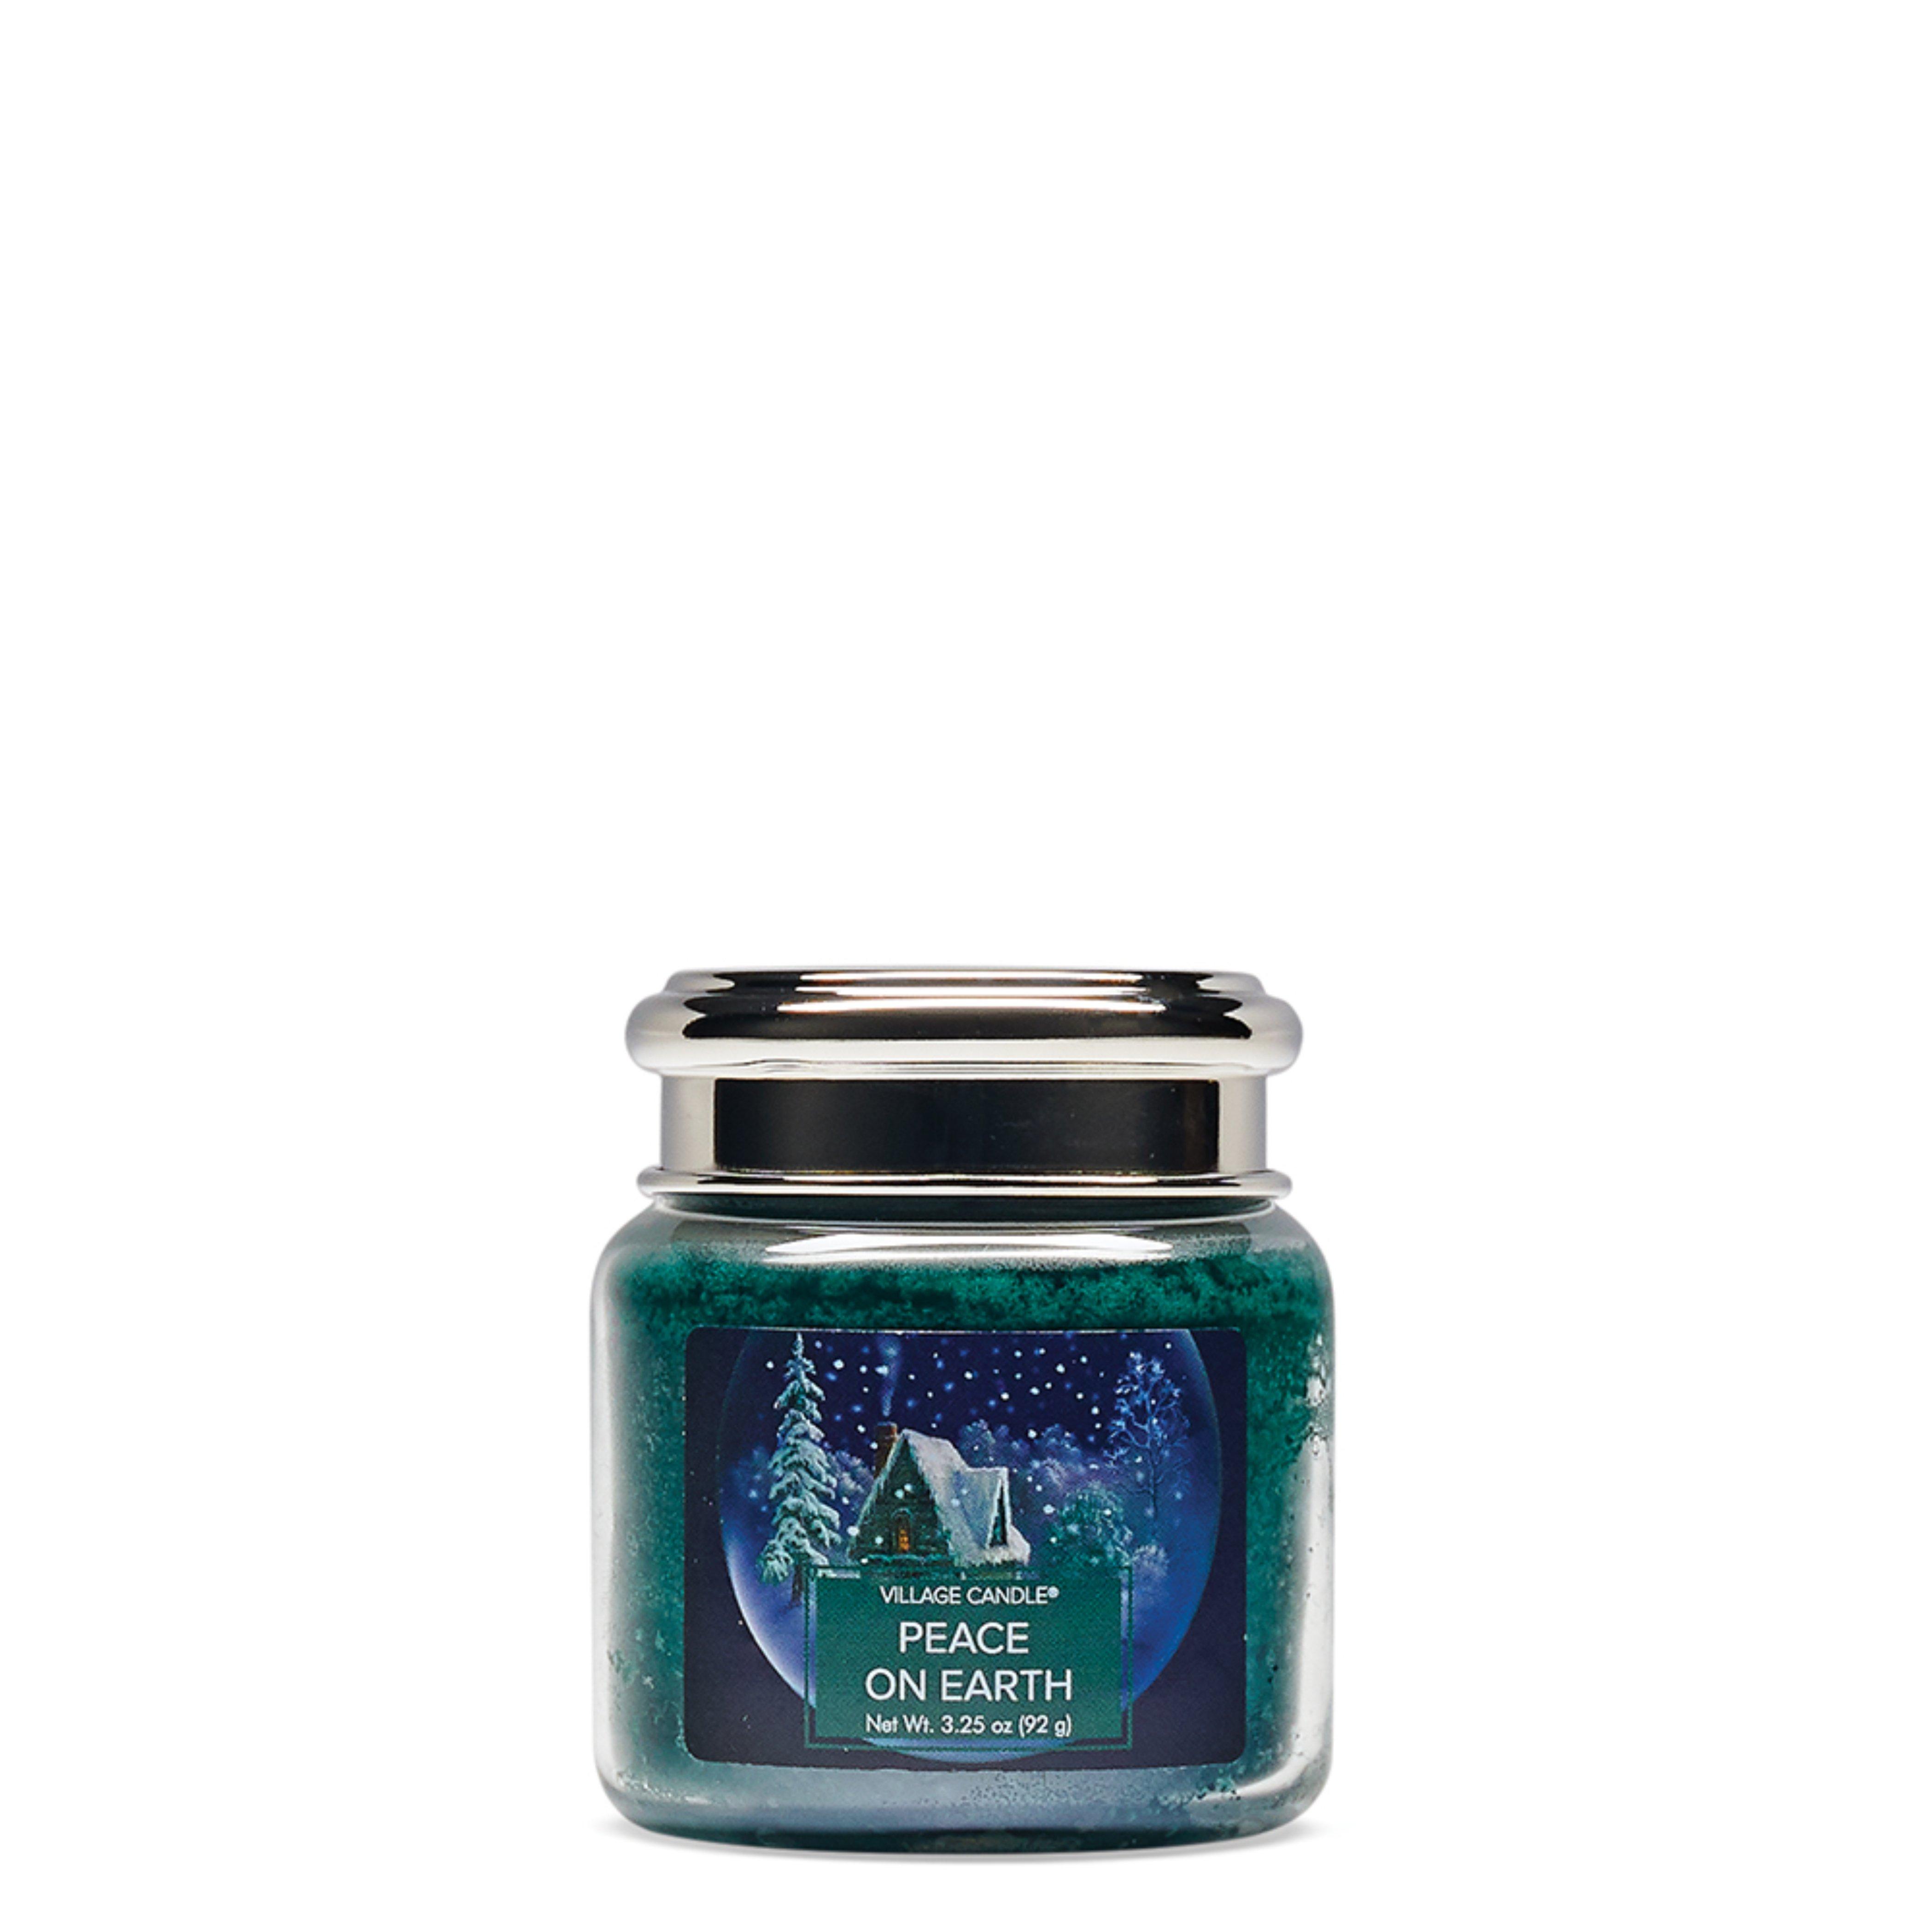 FANTASY Jar Petite 92 g Peace on Earth